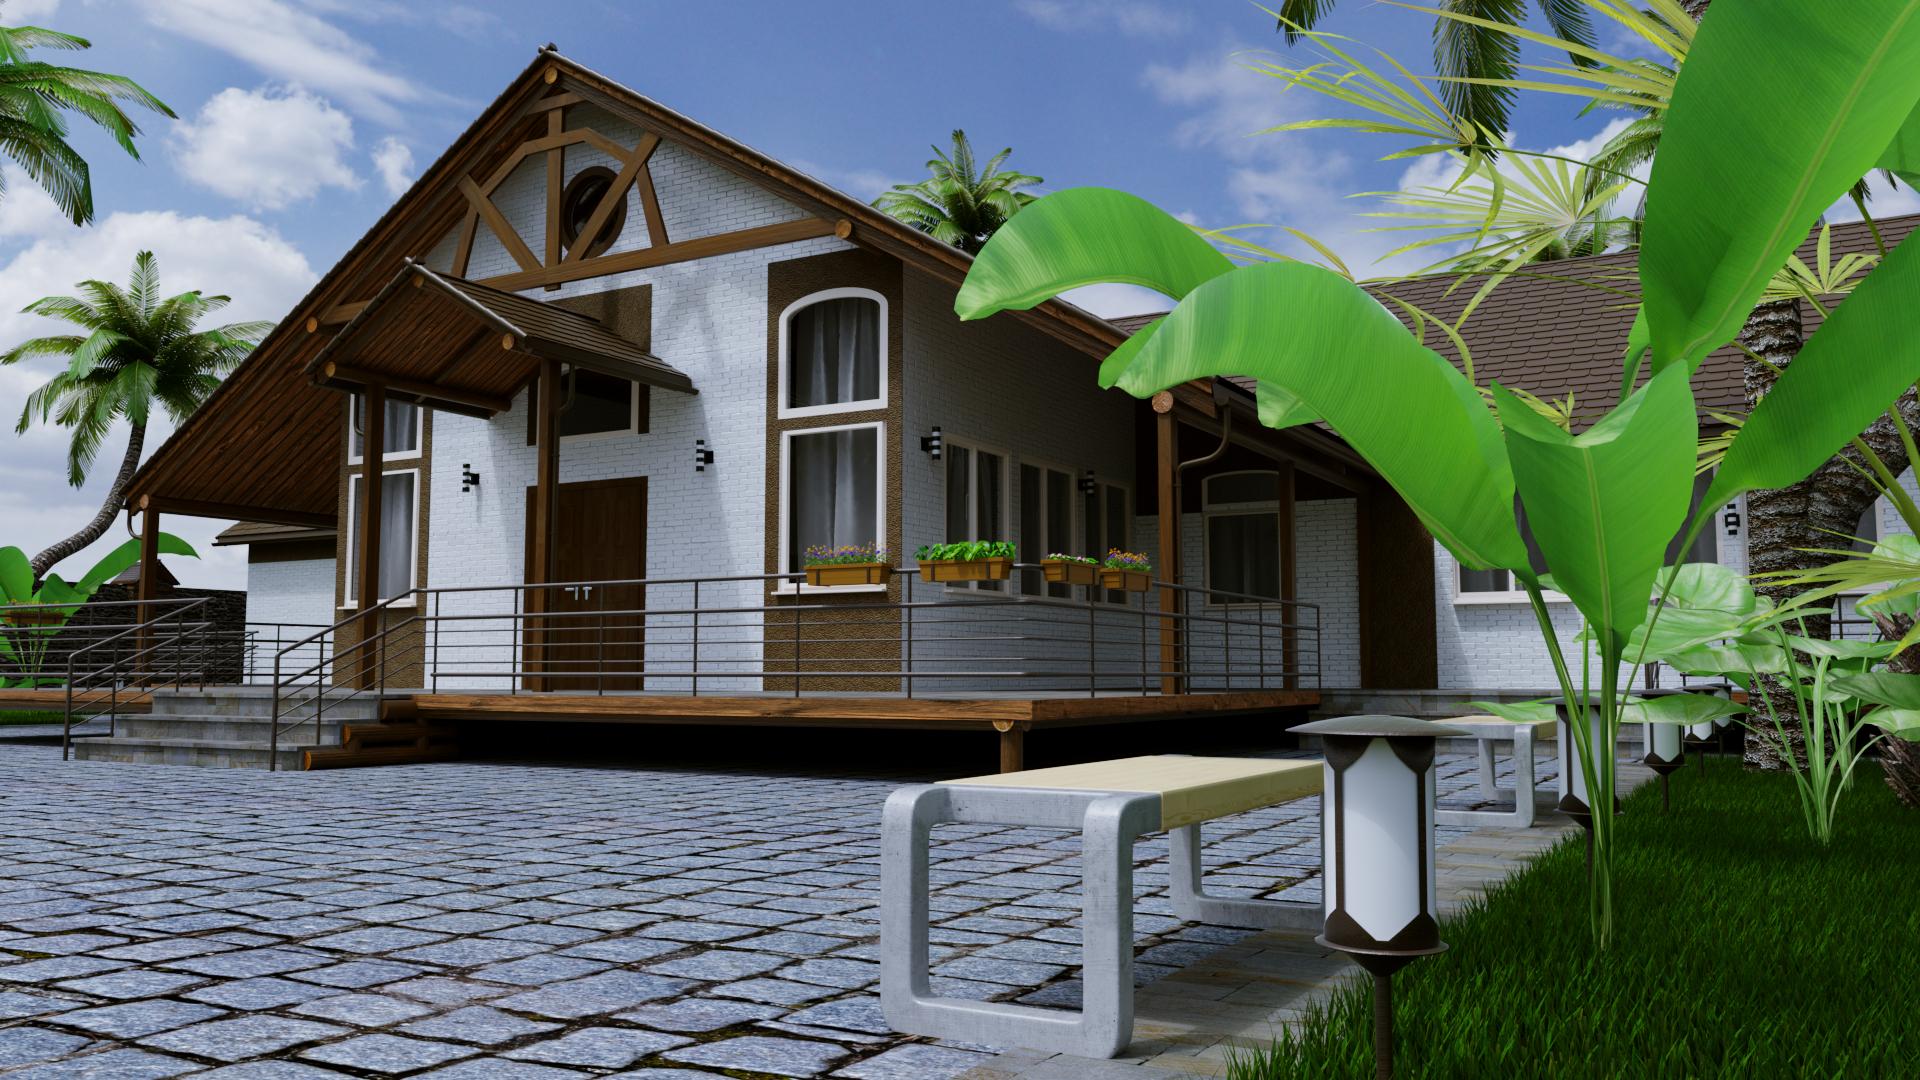 house in Blender cycles render image